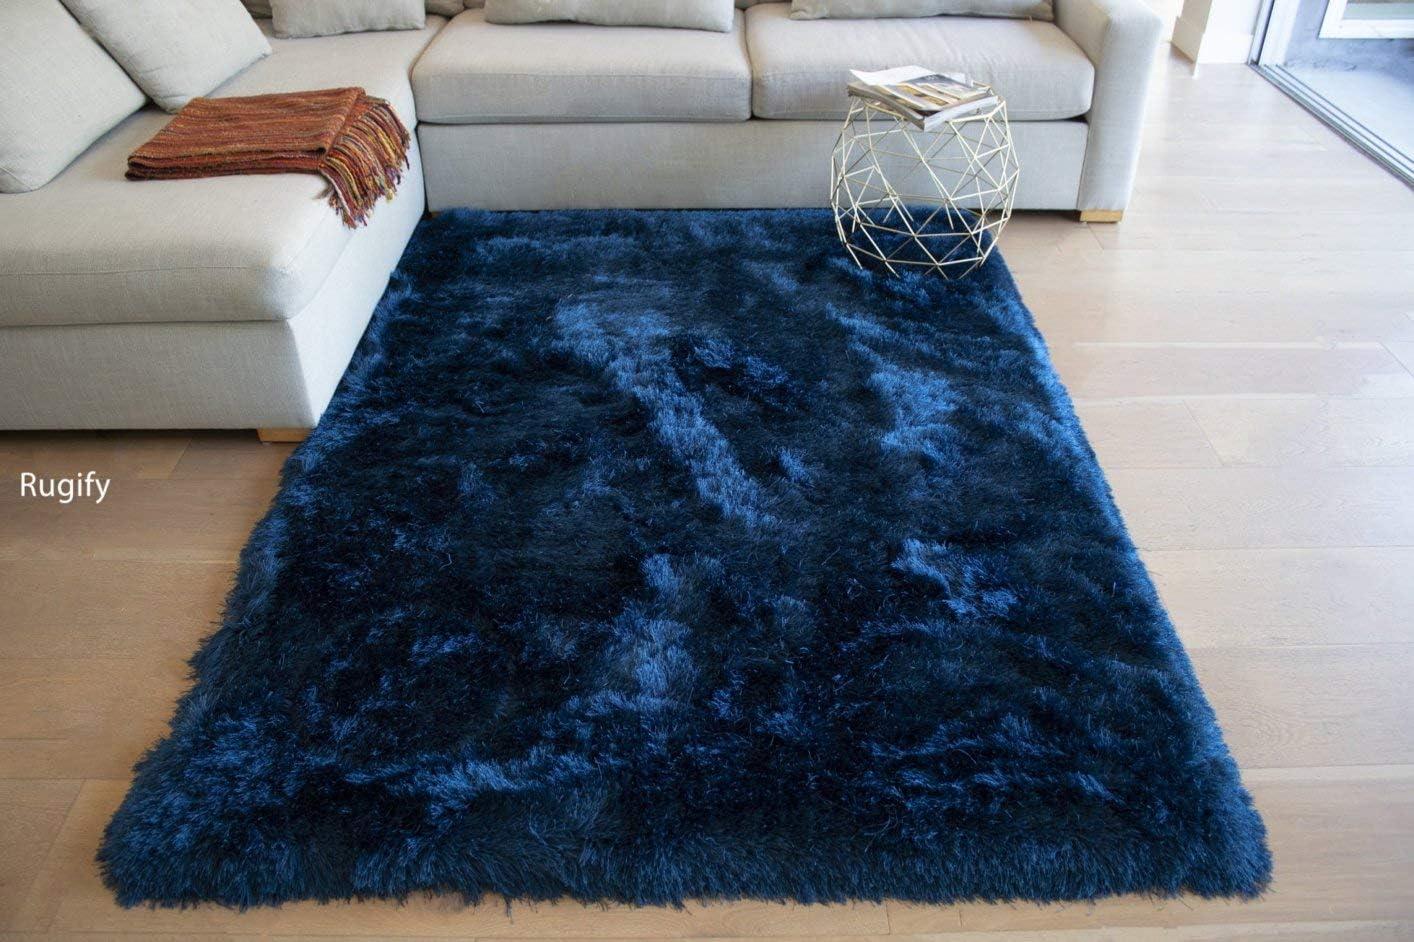 Amazon Com La Rug Linens Home Living Room Bedroom 8x10 Feet Area Rug Carpet Navy Dark Blue Colors Shag Shaggy Shimmer Plush Hand Woven Modern Contemporary Decorative Designer Carpet Kitchen Dining